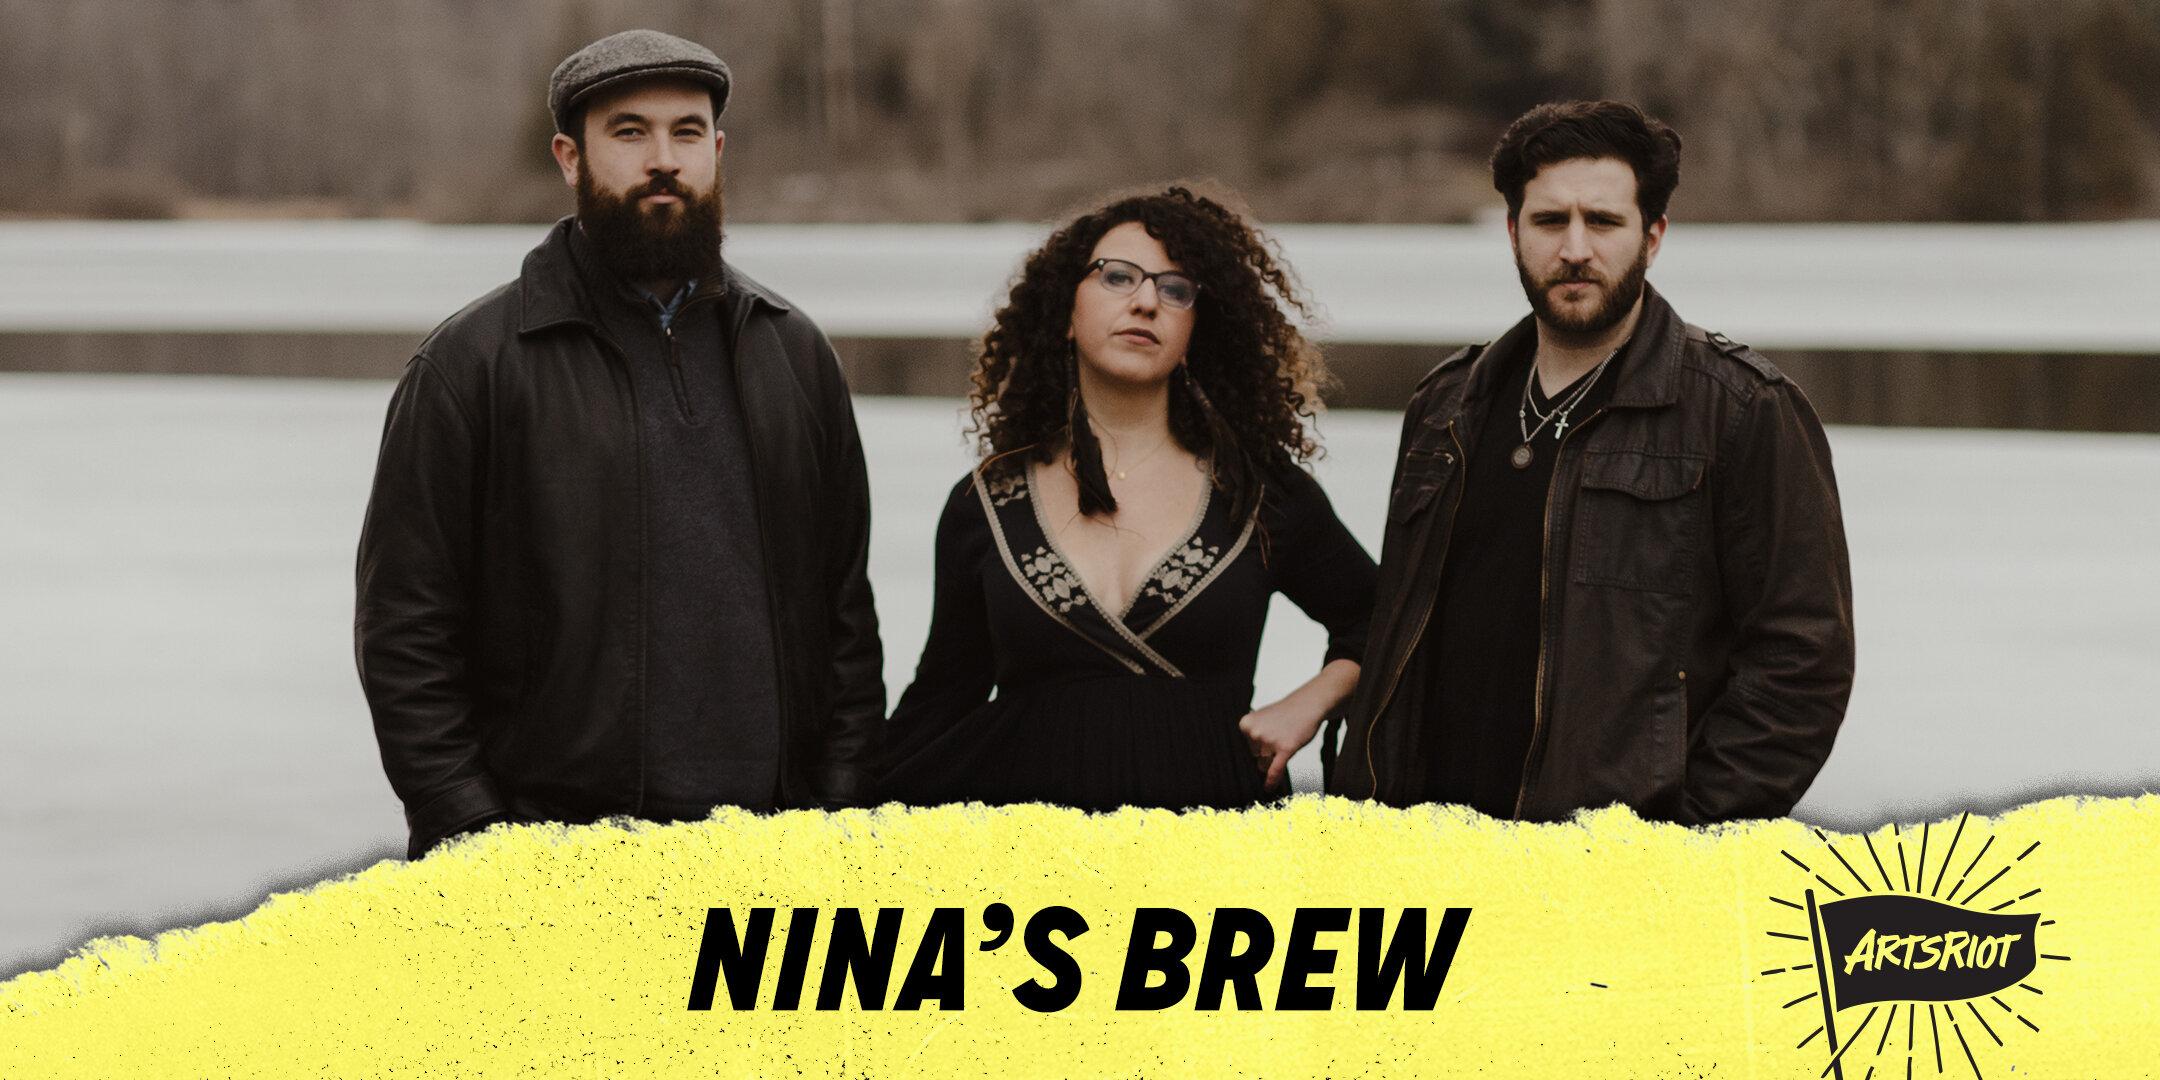 Nina'sBrewBanner.jpg